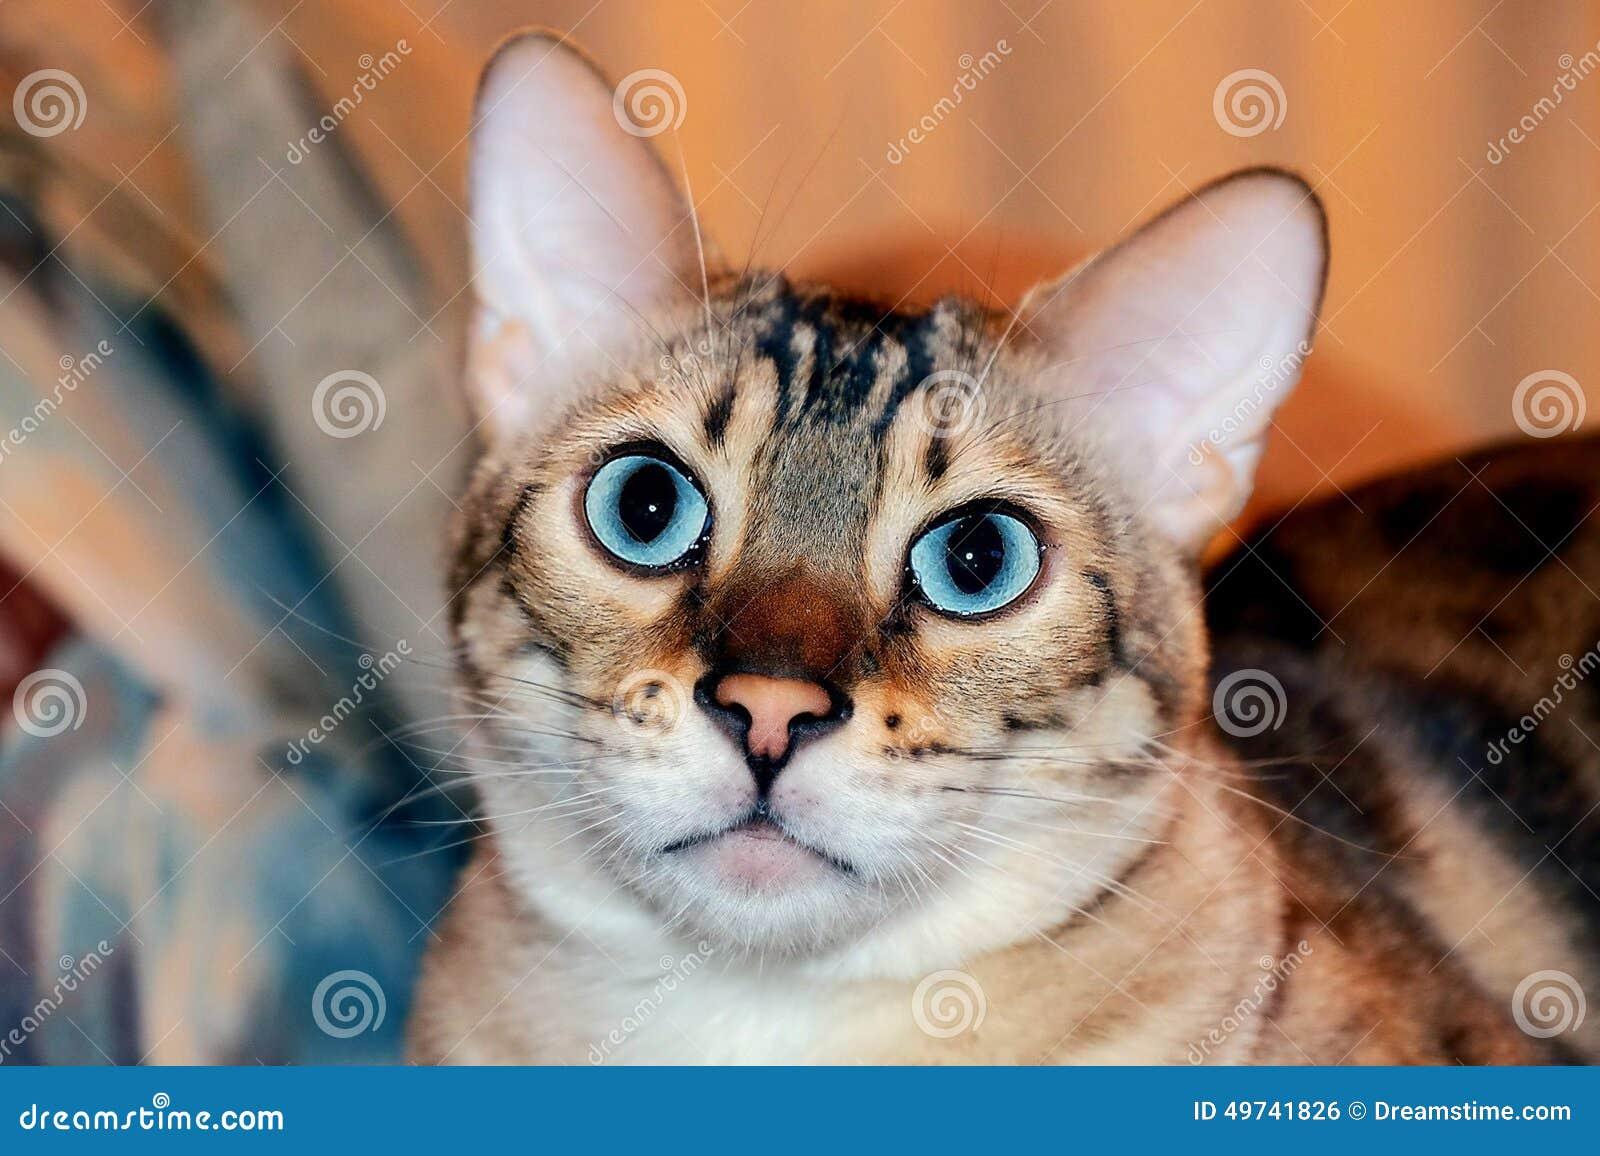 cat block device